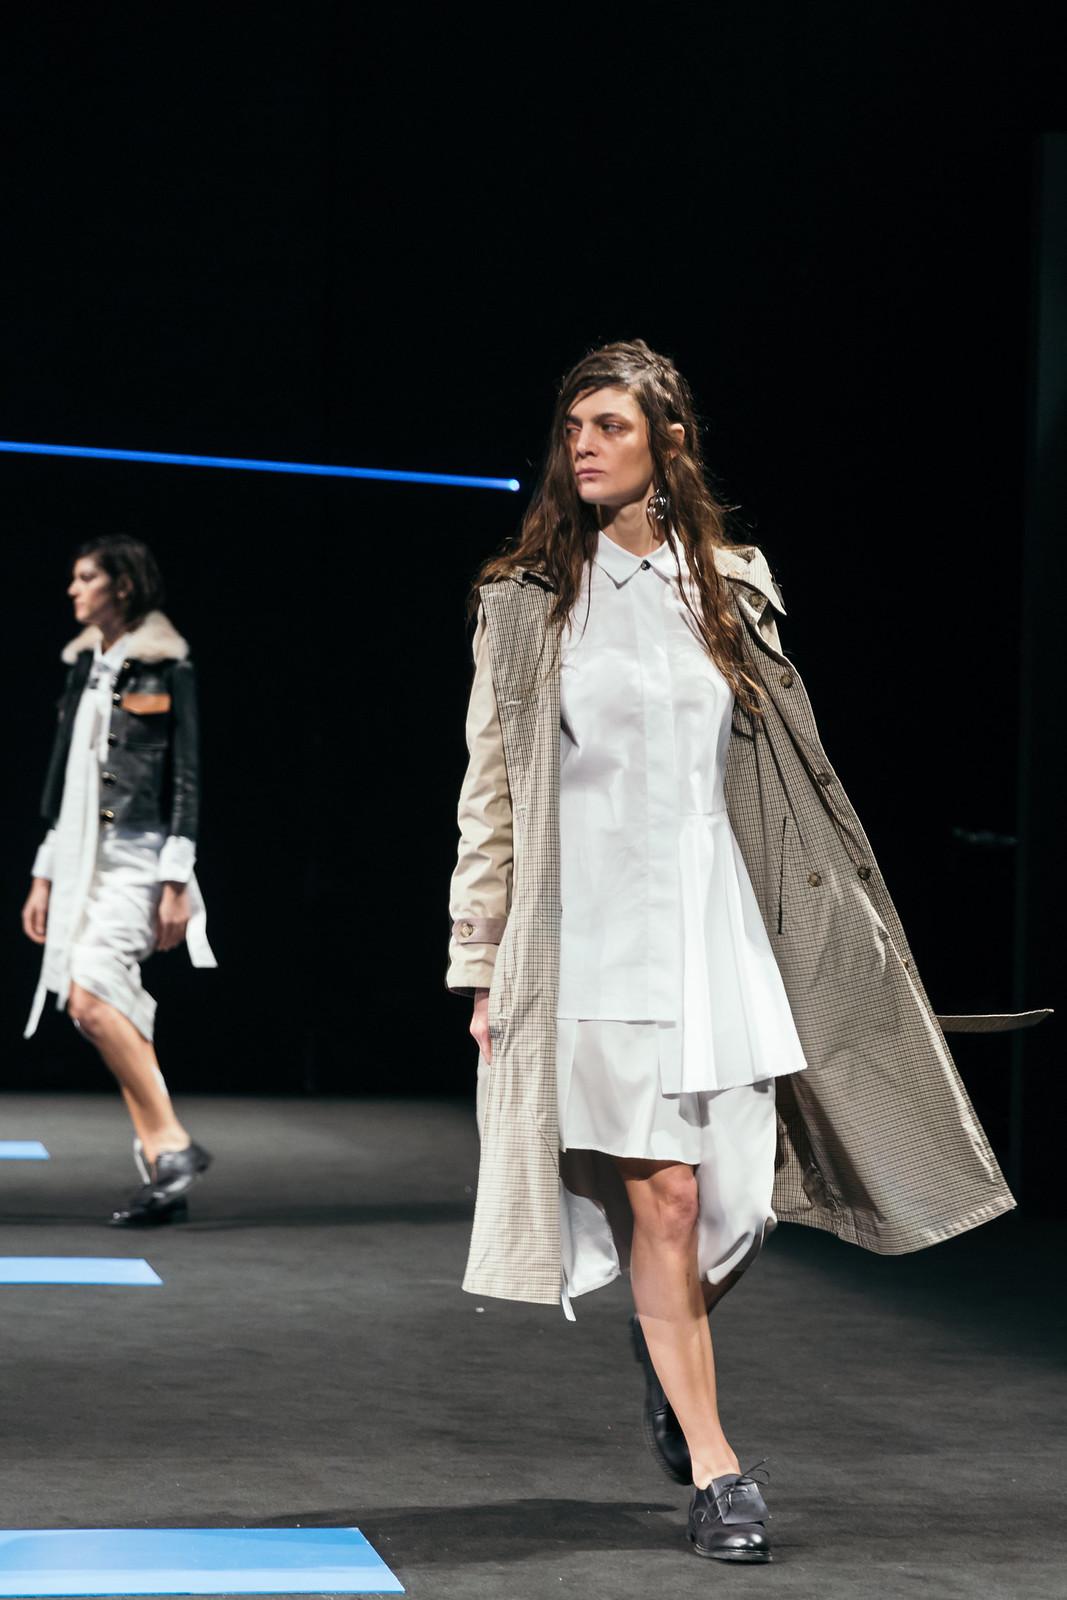 Jessie Chanes - Seams for a desire - 080 Bacelona Fashion #080bcnfasion -41